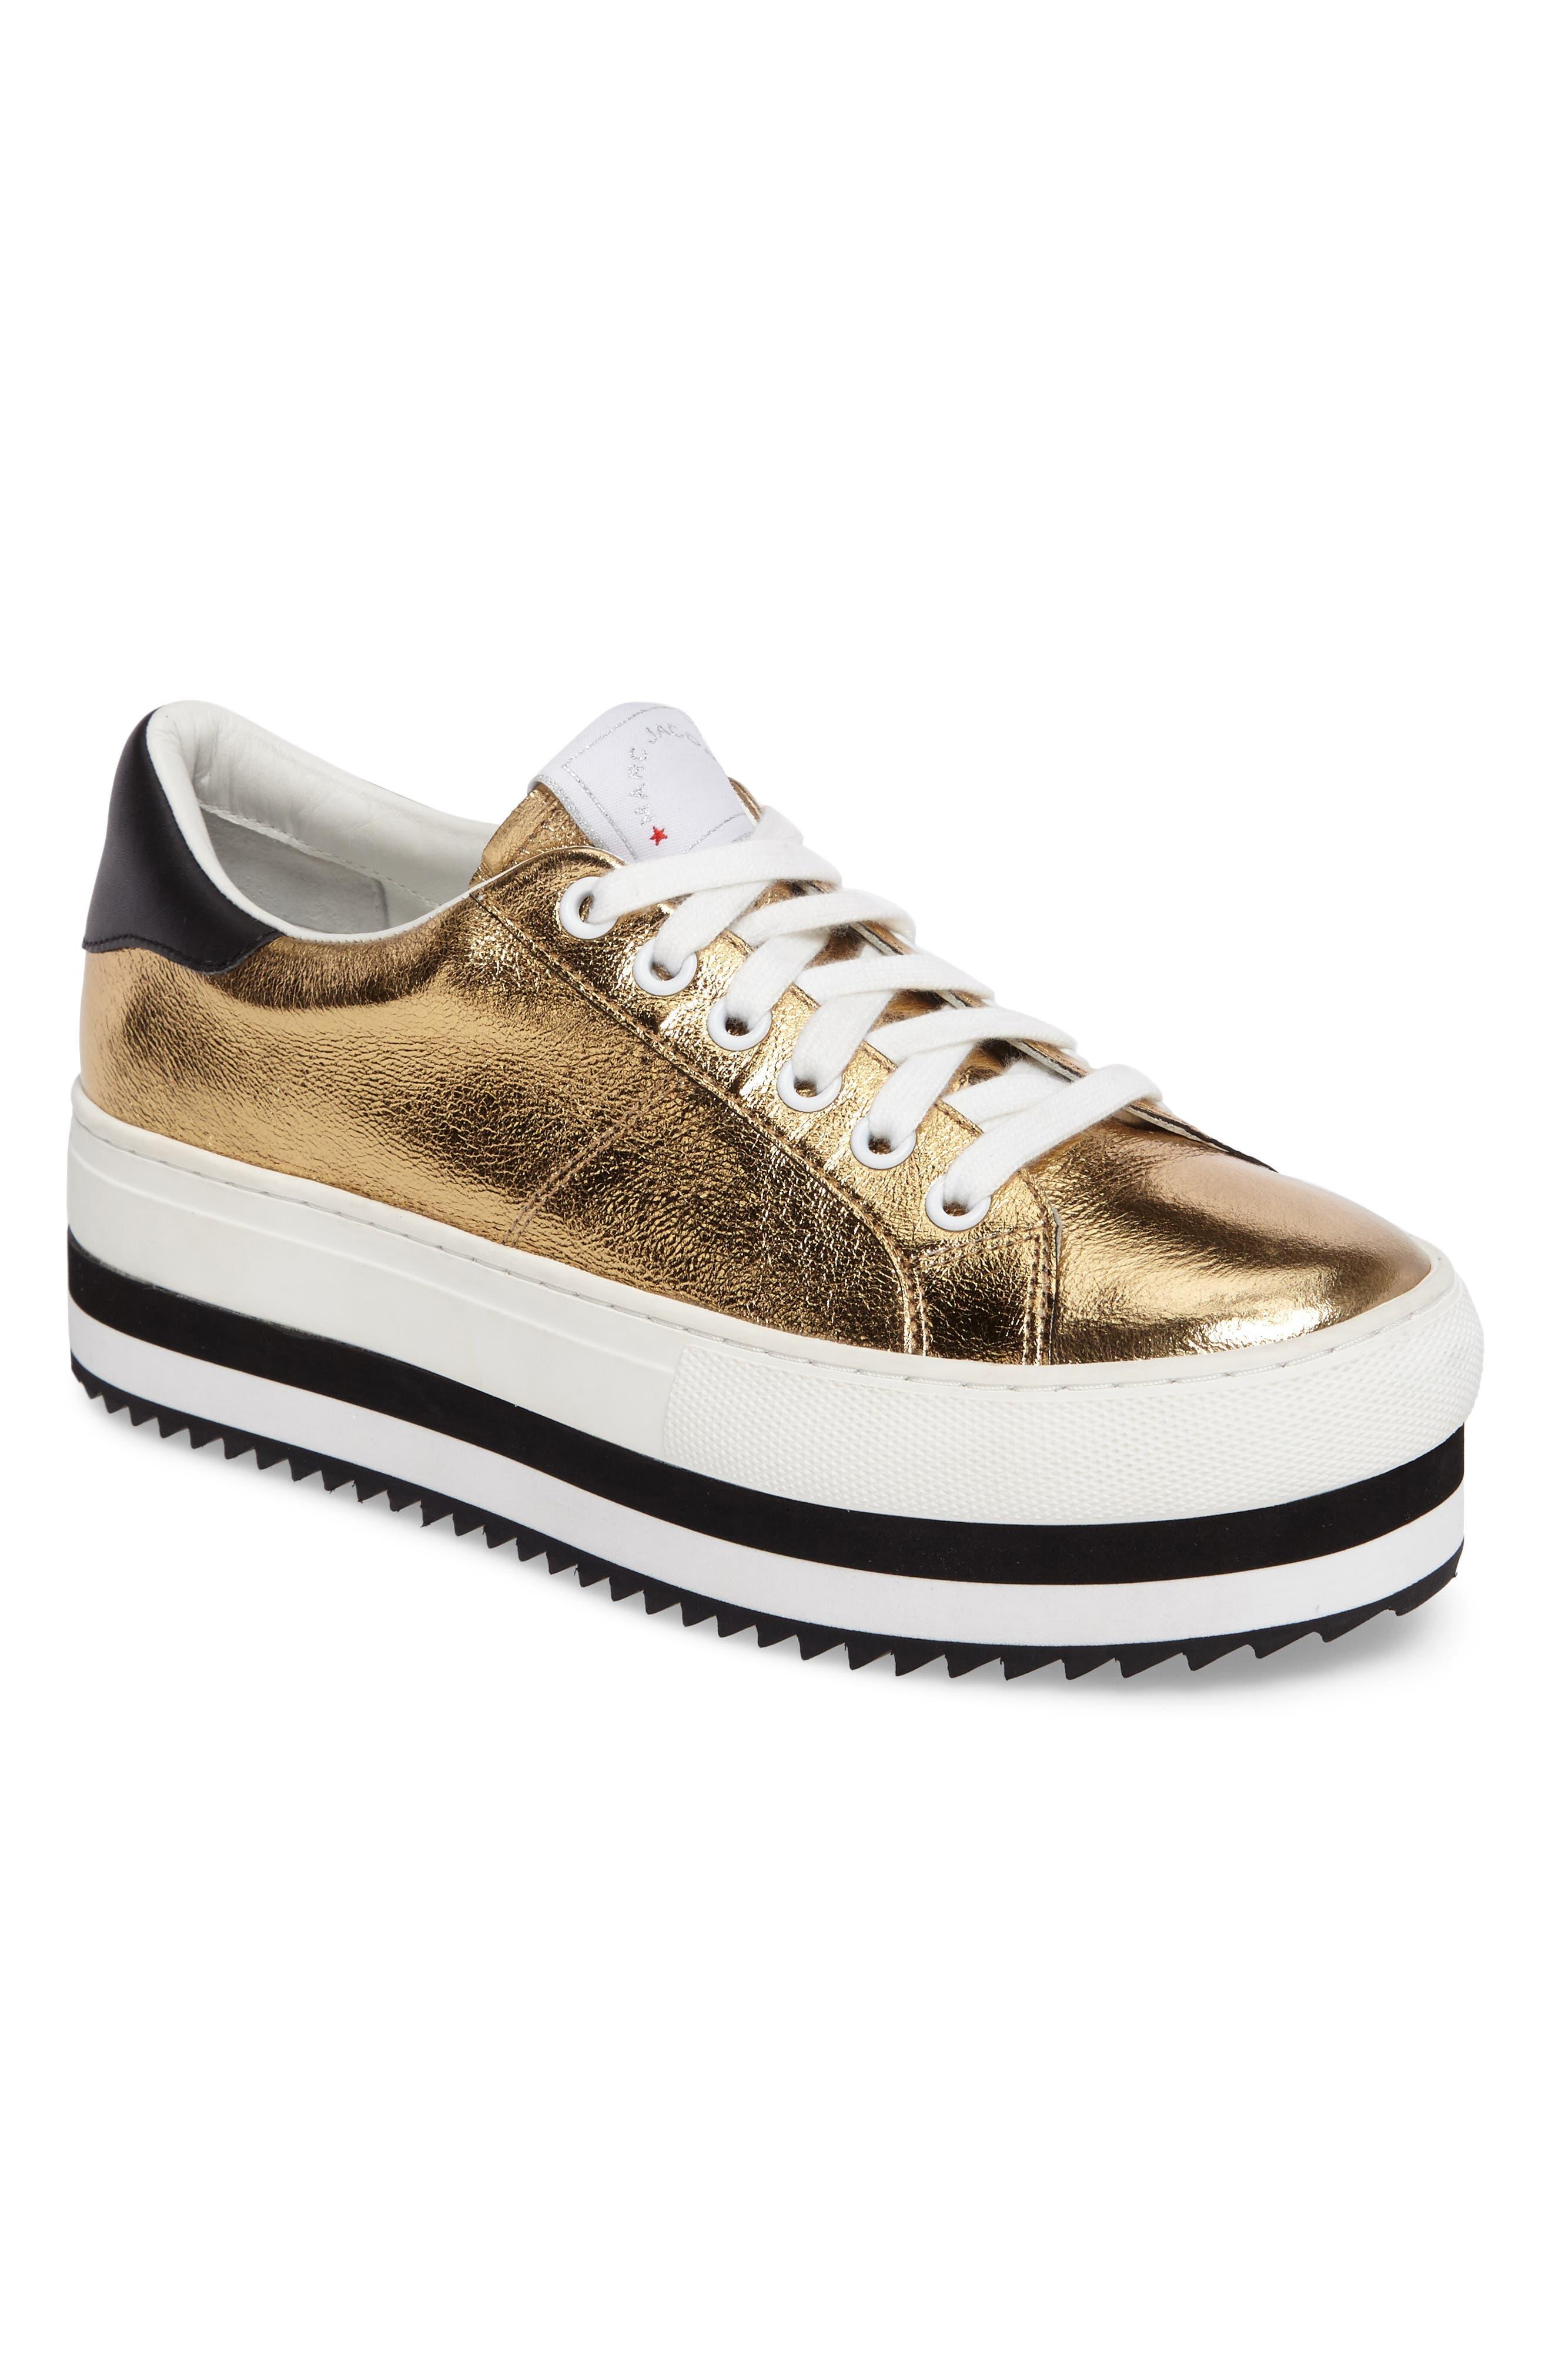 Grand Platform Sneaker,                             Main thumbnail 1, color,                             Gold